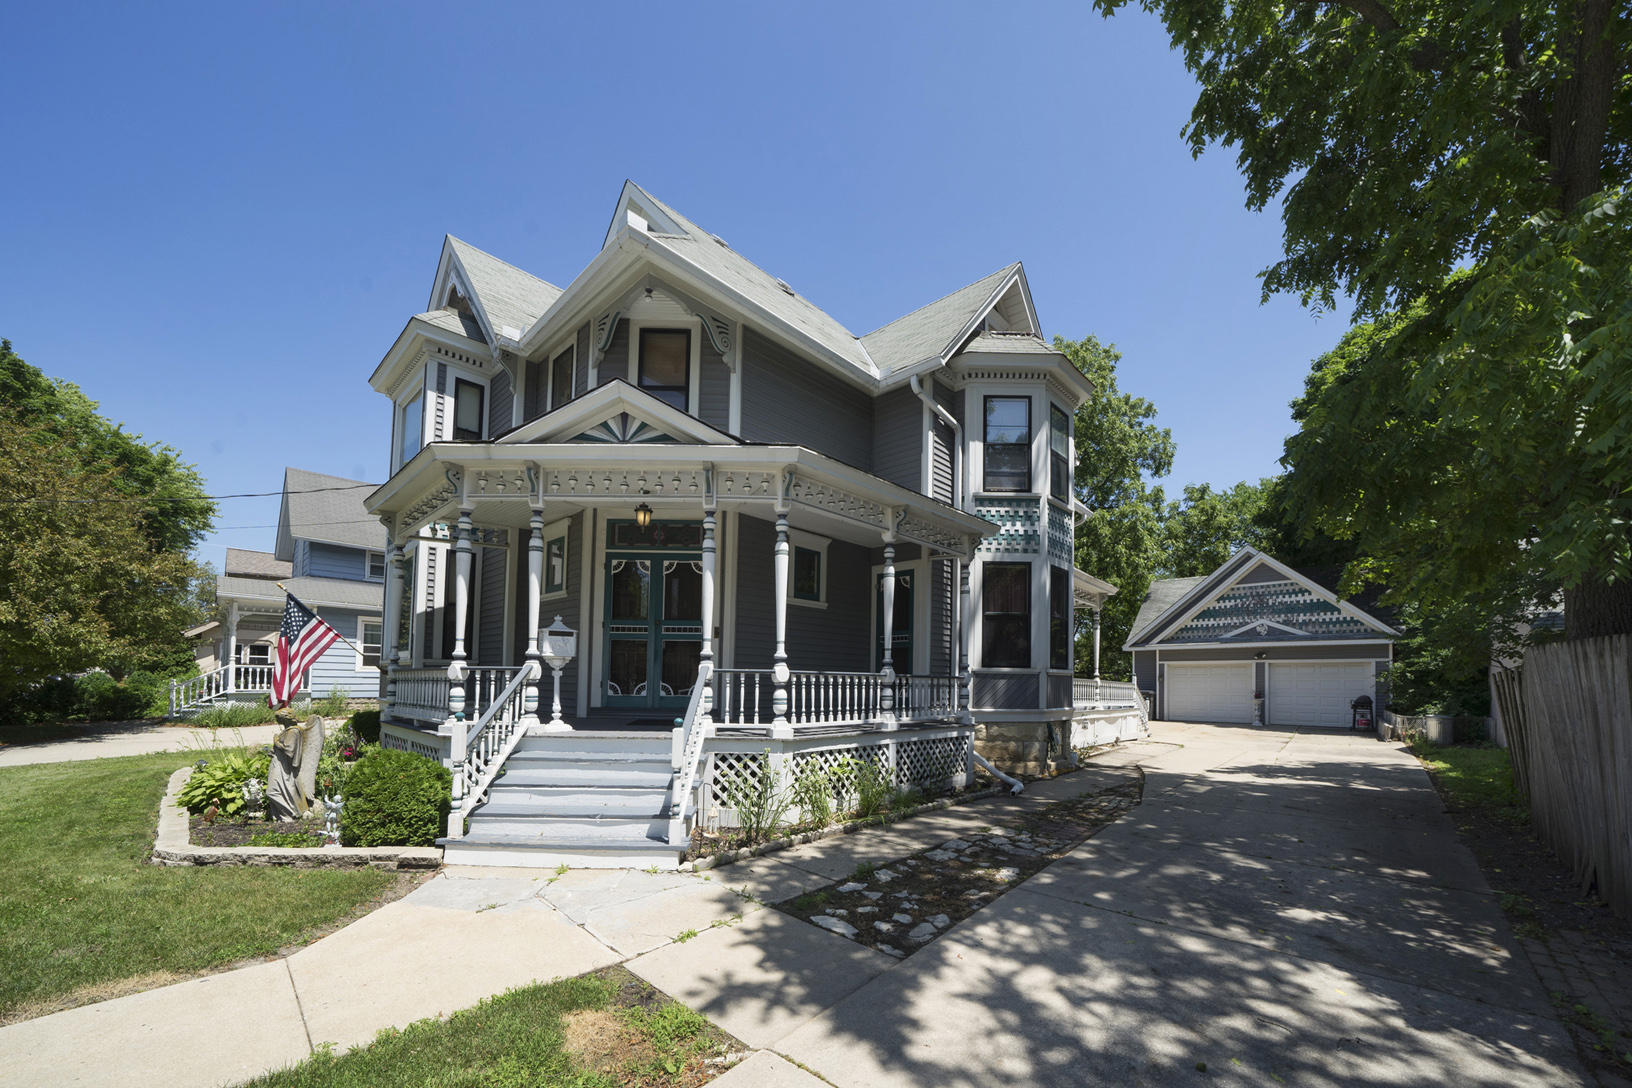 611 Oakland Ave, Waukesha, Wisconsin 53186, 4 Bedrooms Bedrooms, 10 Rooms Rooms,2 BathroomsBathrooms,Single-Family,For Sale,Oakland Ave,1648253